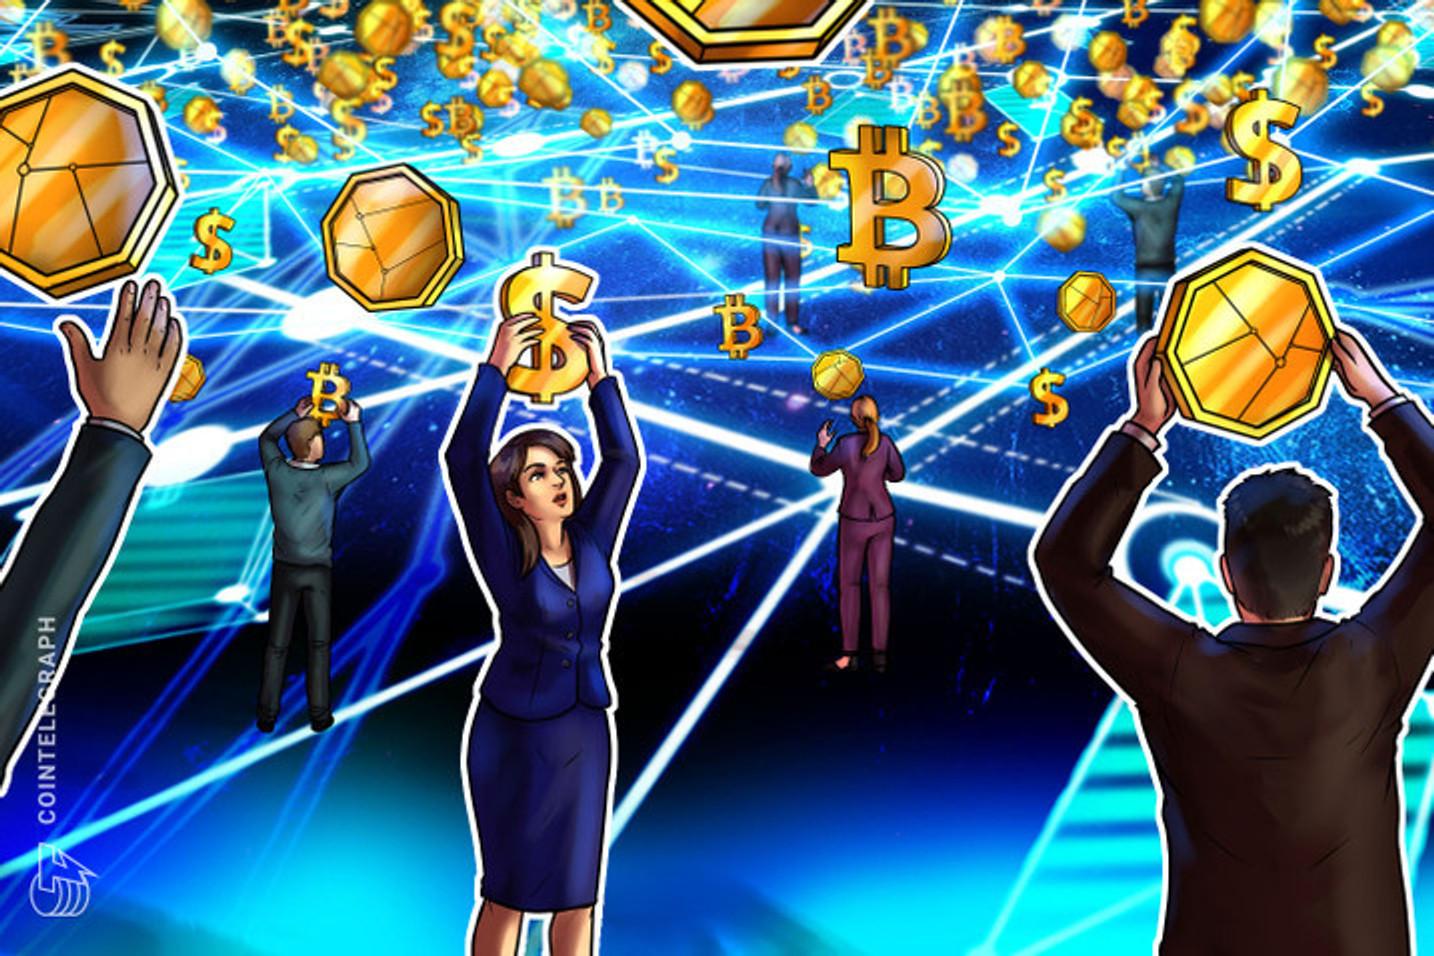 Banco Central edita nova regra e pode permitir que fintechs de Bitcoin atuem no mercado de câmbio